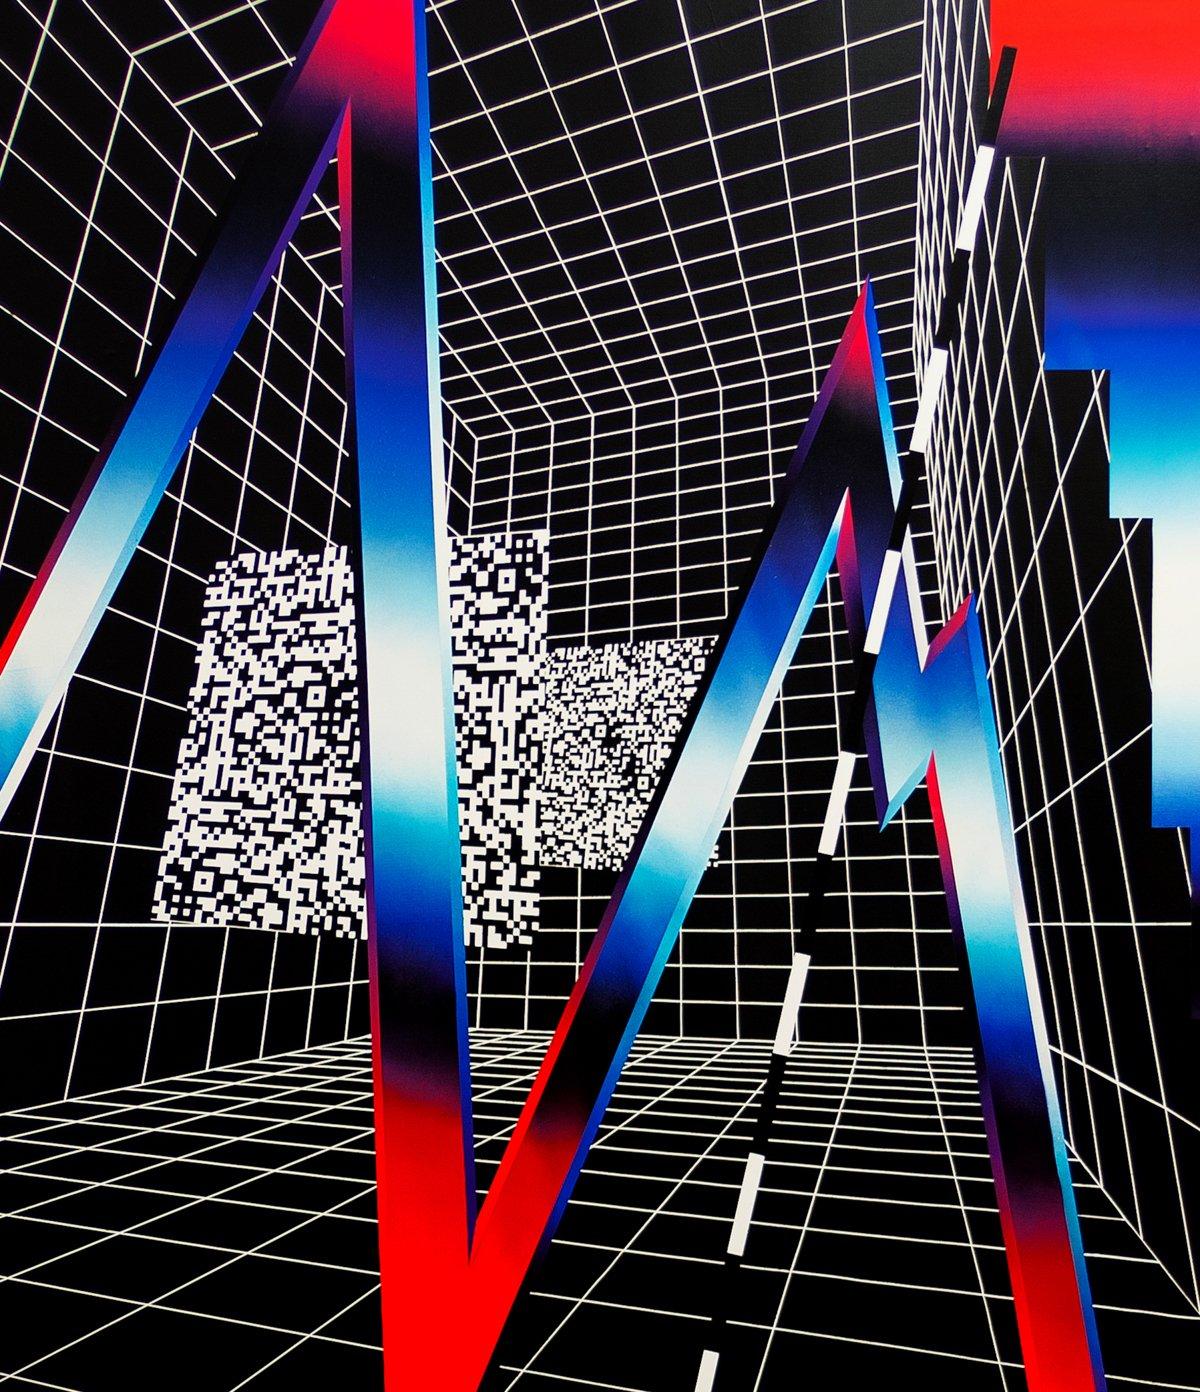 Dynamic Phenomena Dynamic Phenomena Felipe Pantone Danisz